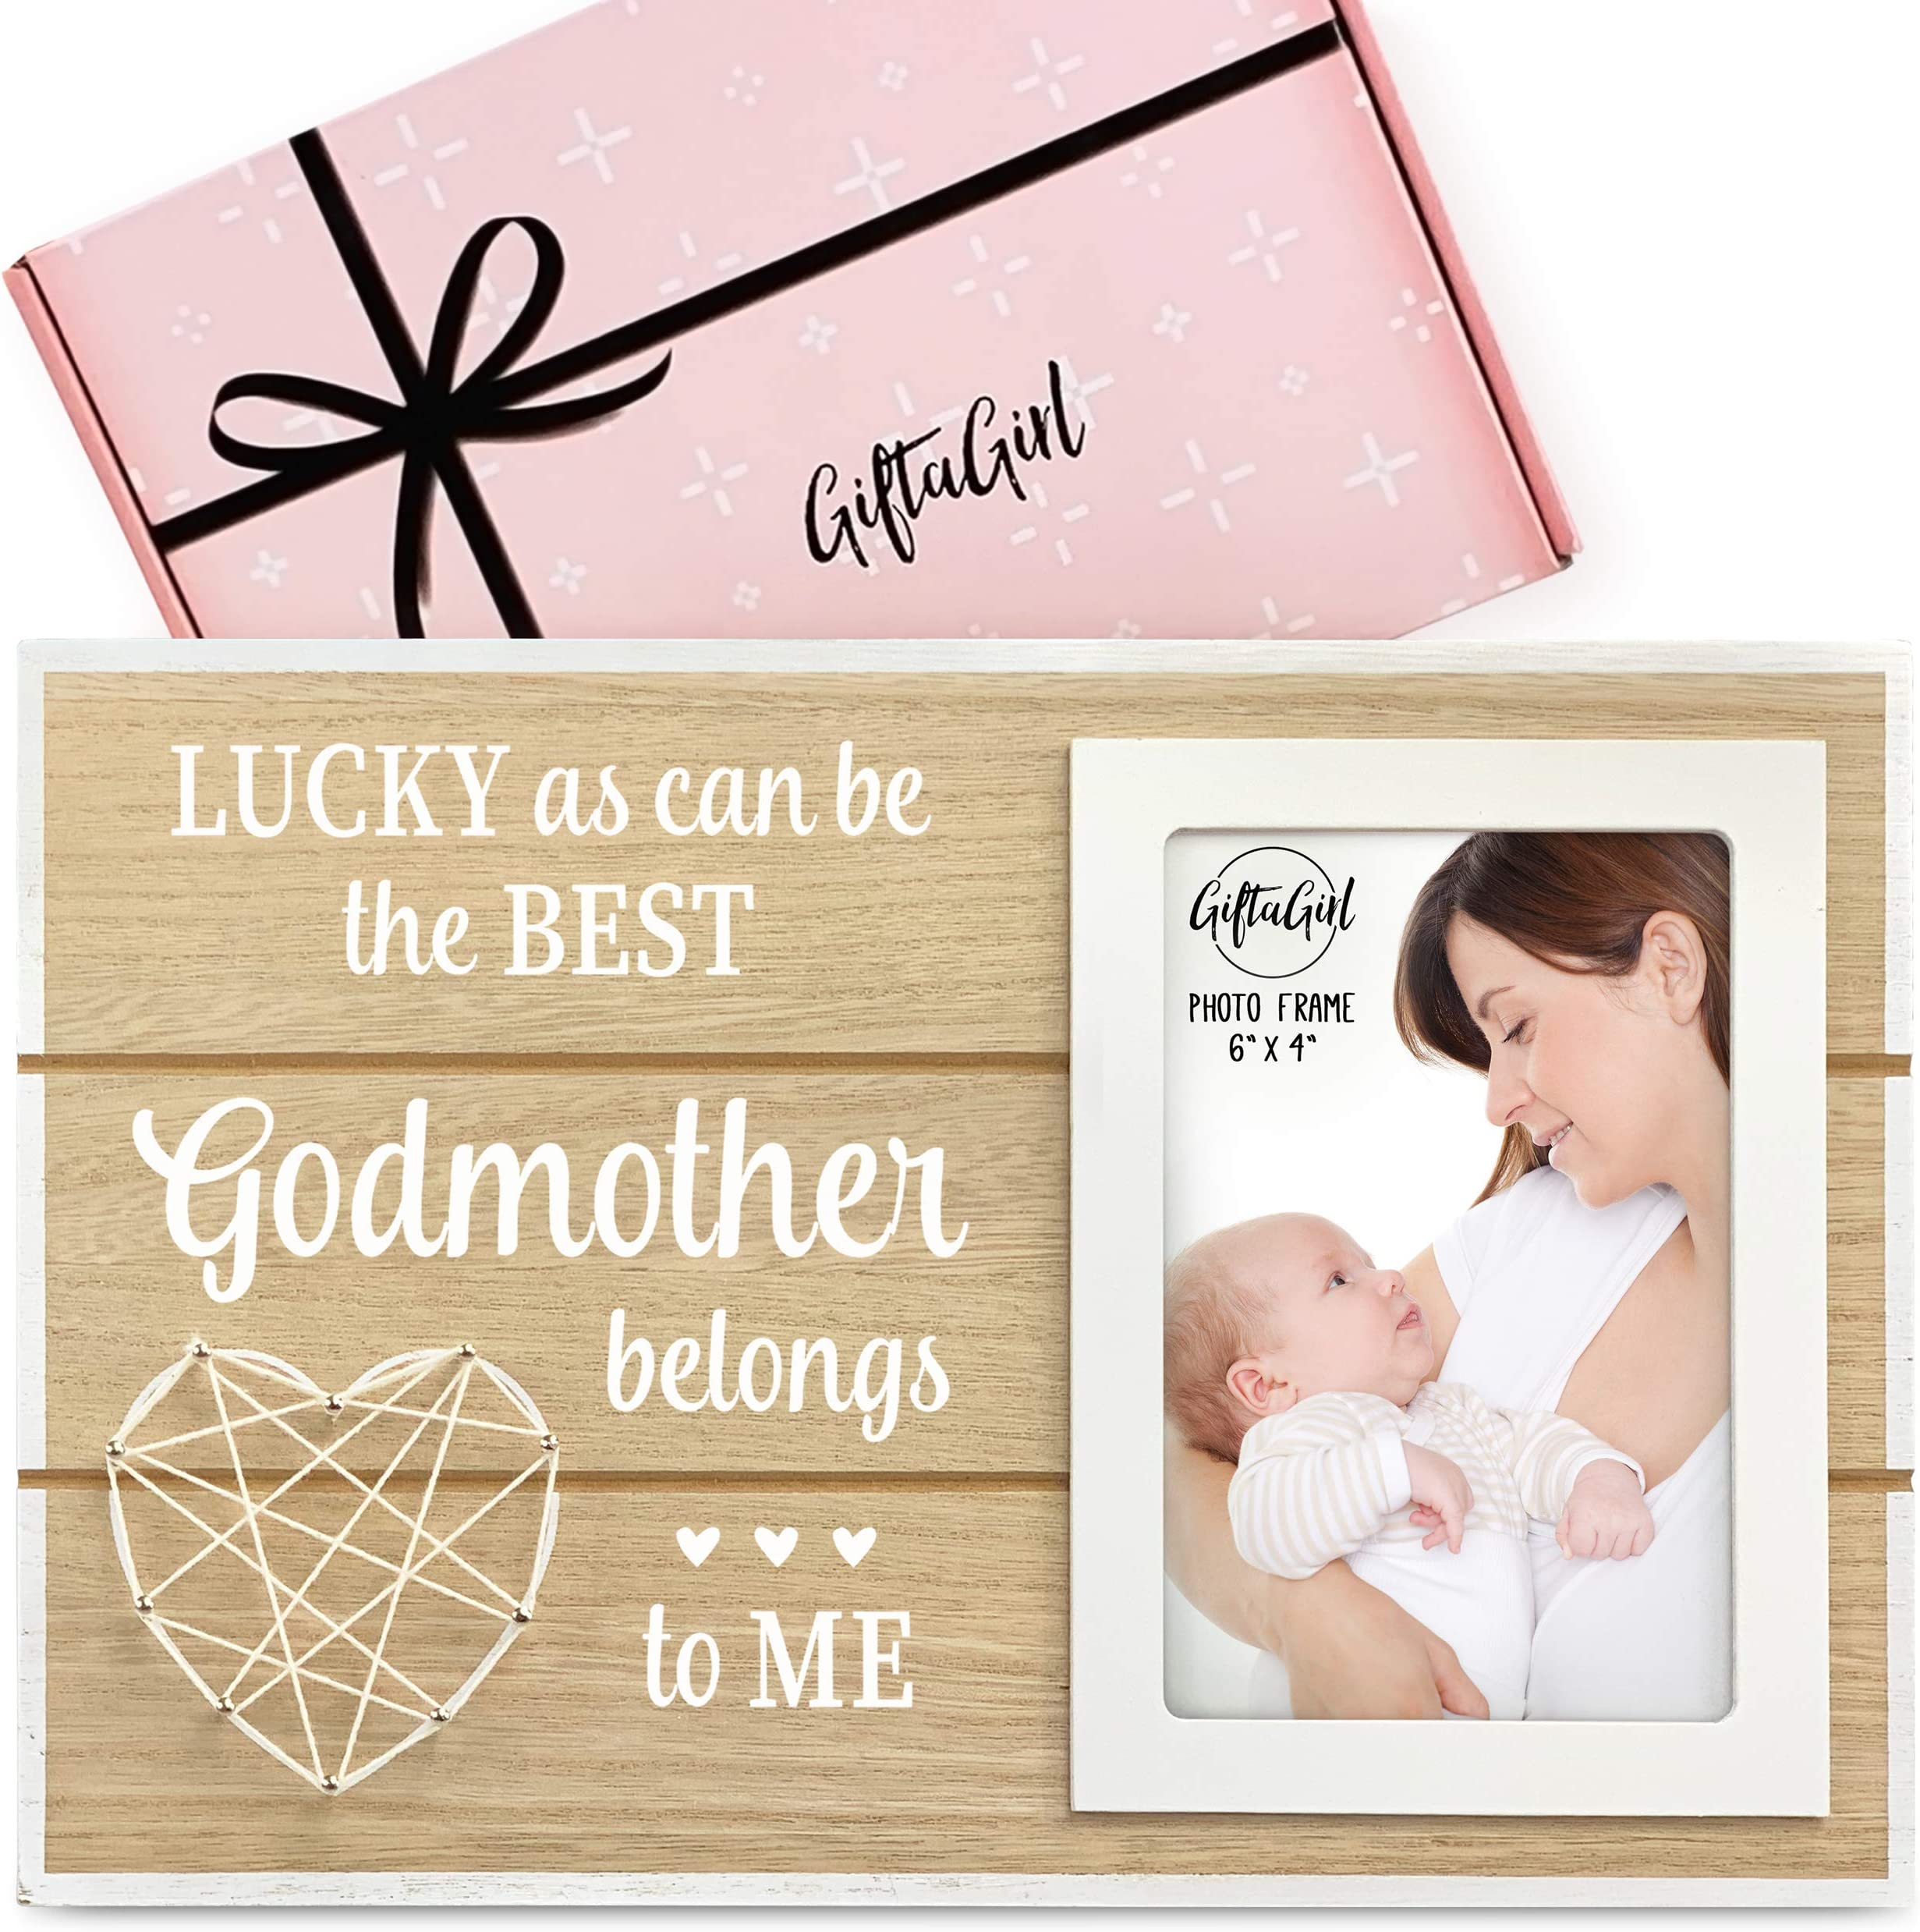 Godmother Present Godchild Baptism Godmother Picture Frame Gift Godson Dedication Christening Goddaughter Lucky To Call You My